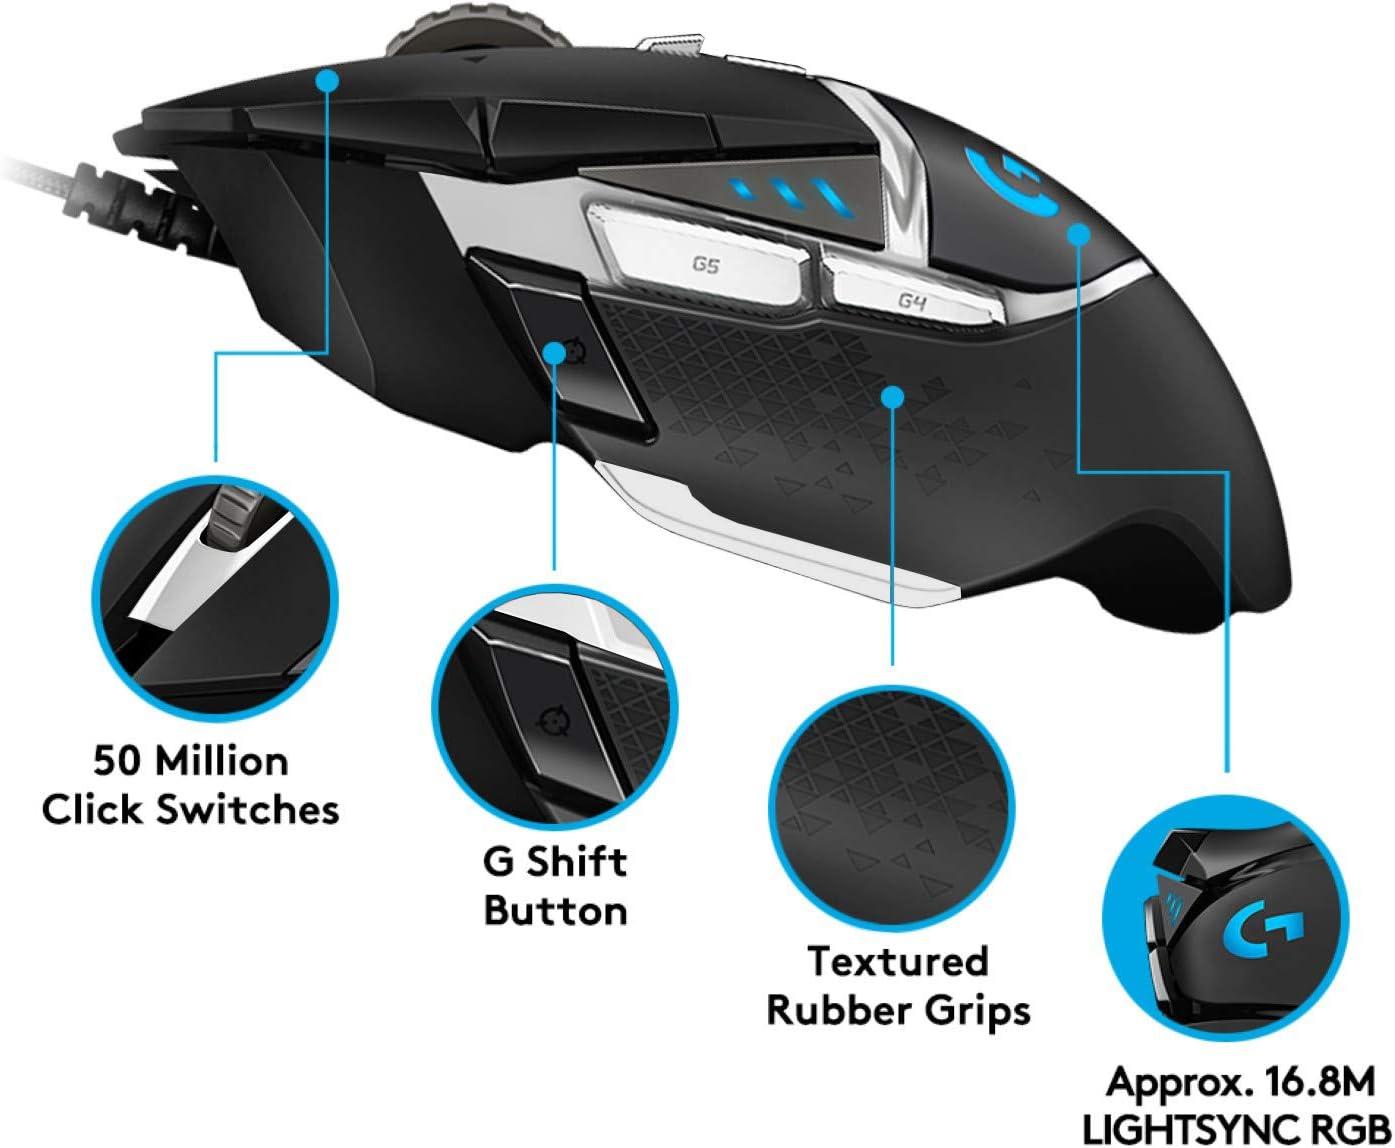 Long Battery Life Black Hero 16K Sensor On-Board Memory 11 Programmable Buttons 16,000 DPI RGB PC//Mac Logitech G502 Lightspeed Wireless Gaming Mouse Adjustable Weights